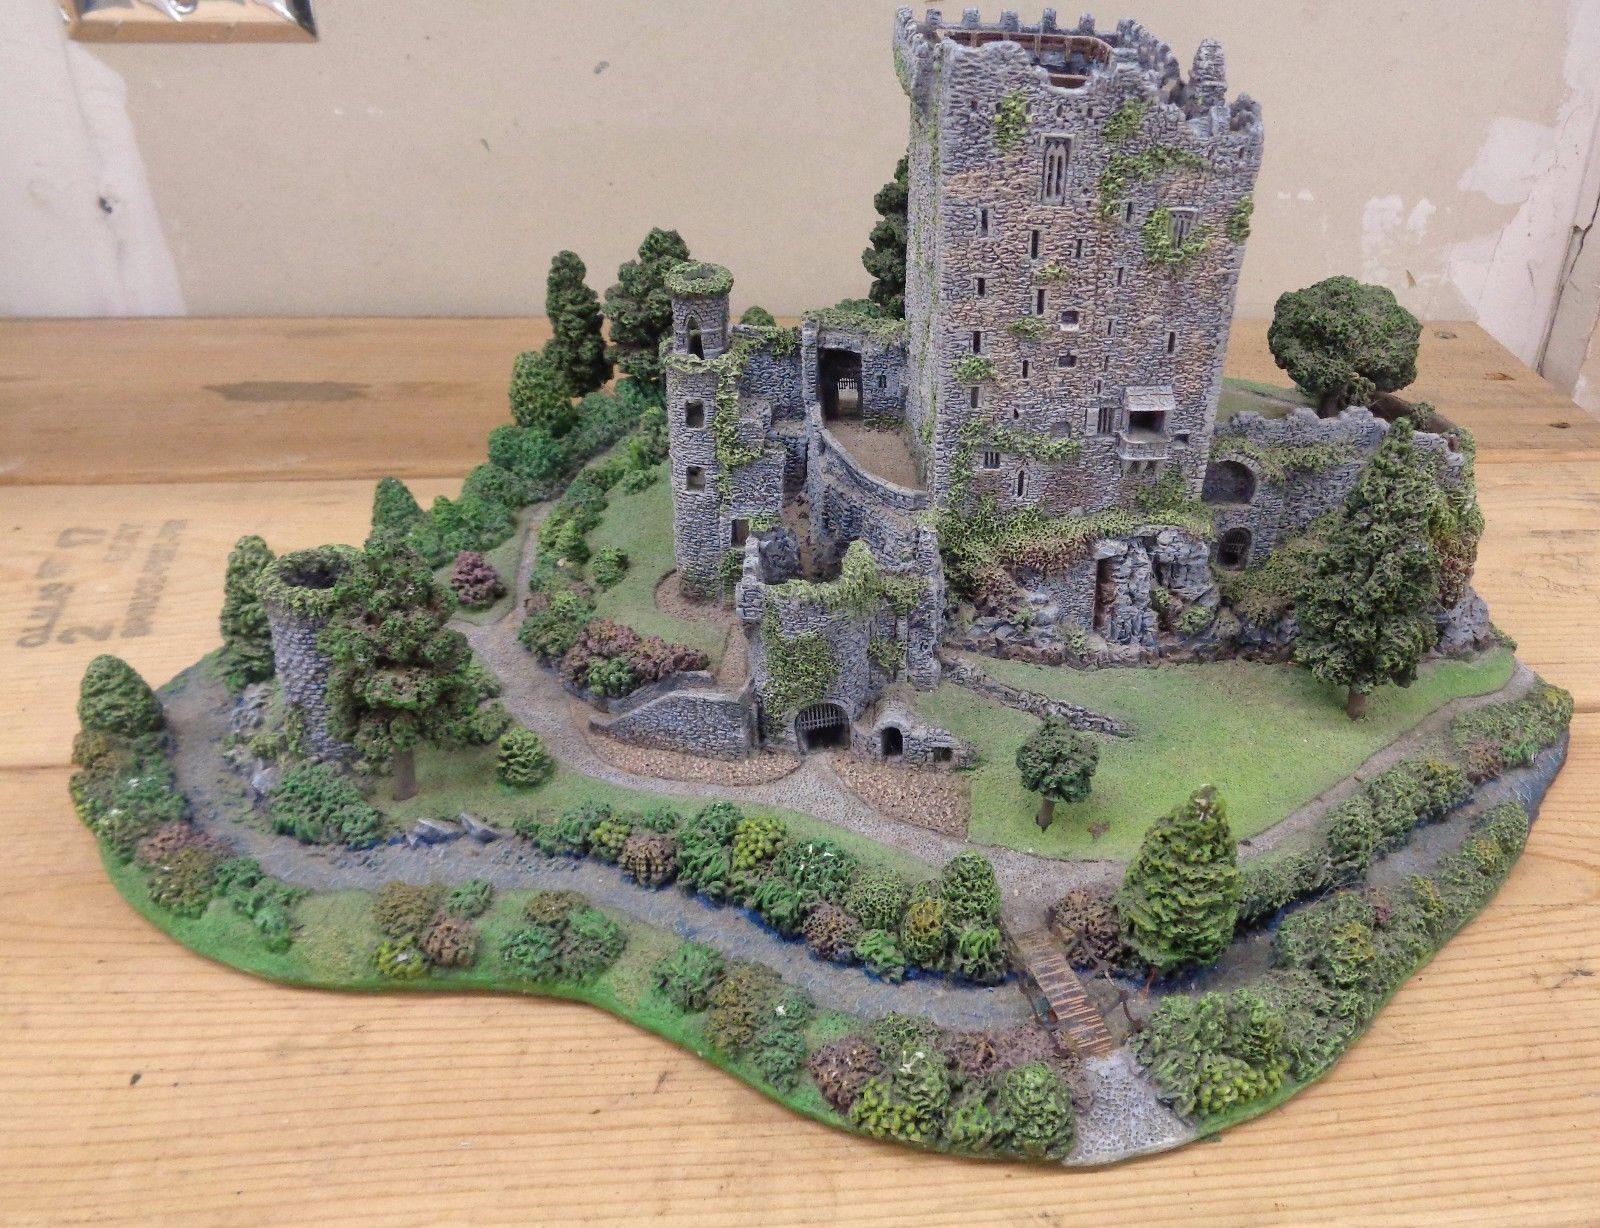 danbury mint blarney castle sculpture county cork with amazingly detail ireland